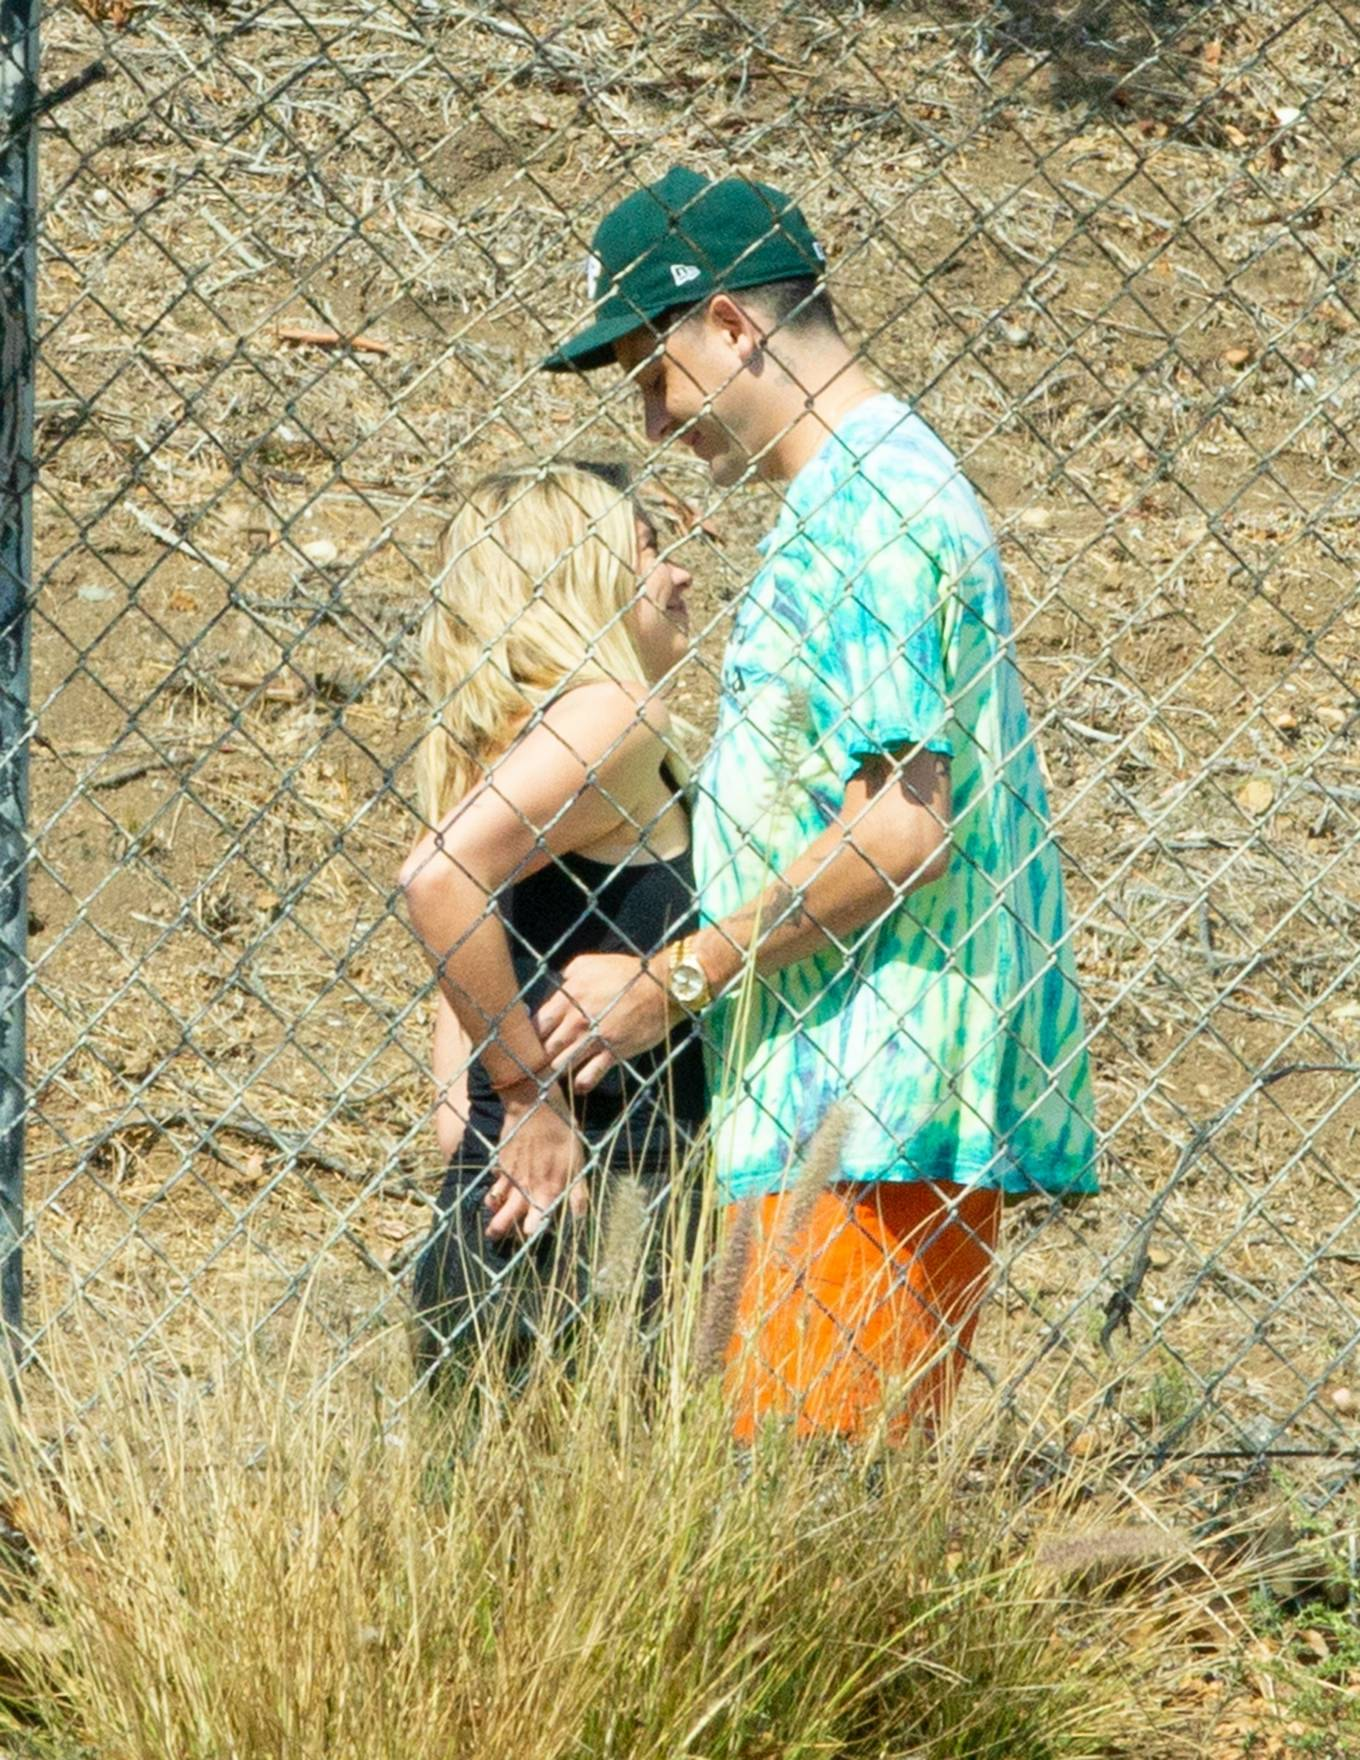 Ashley Benson 2020 : Ashley Benson and boyfriend G-Eazy as she arrives at his video shoot in Malibu-18